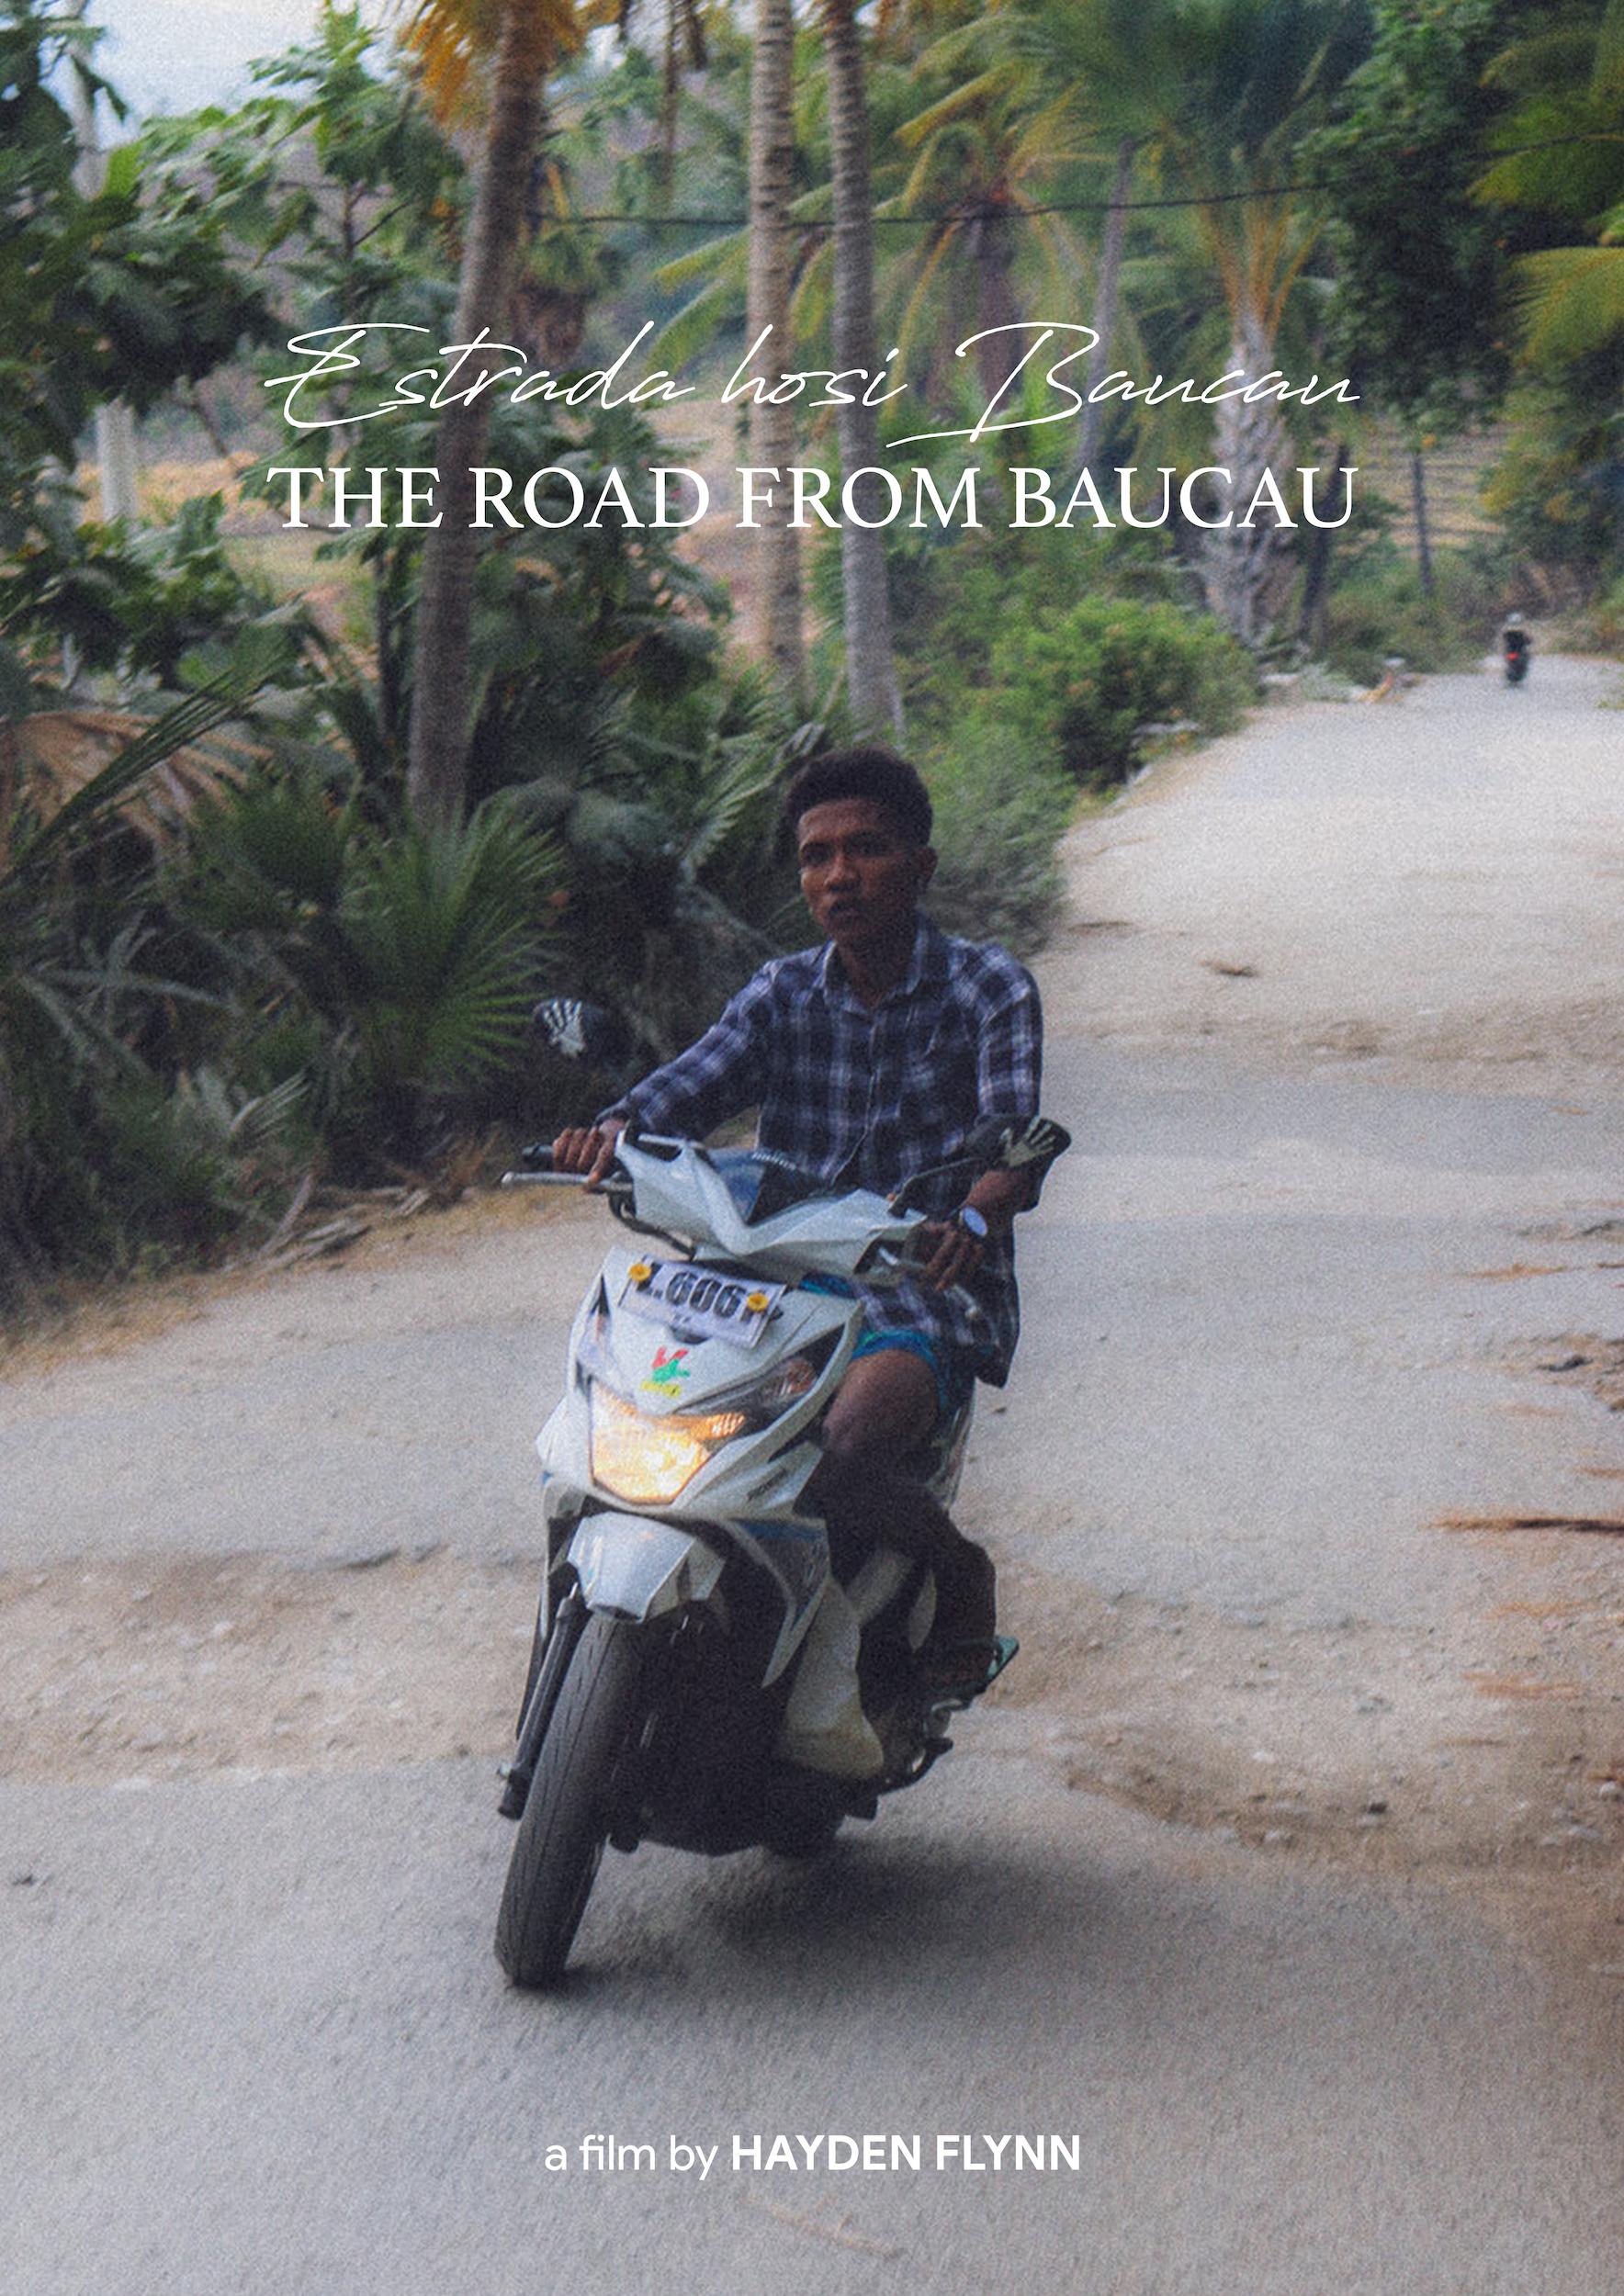 The Road from Baucau - January 2019